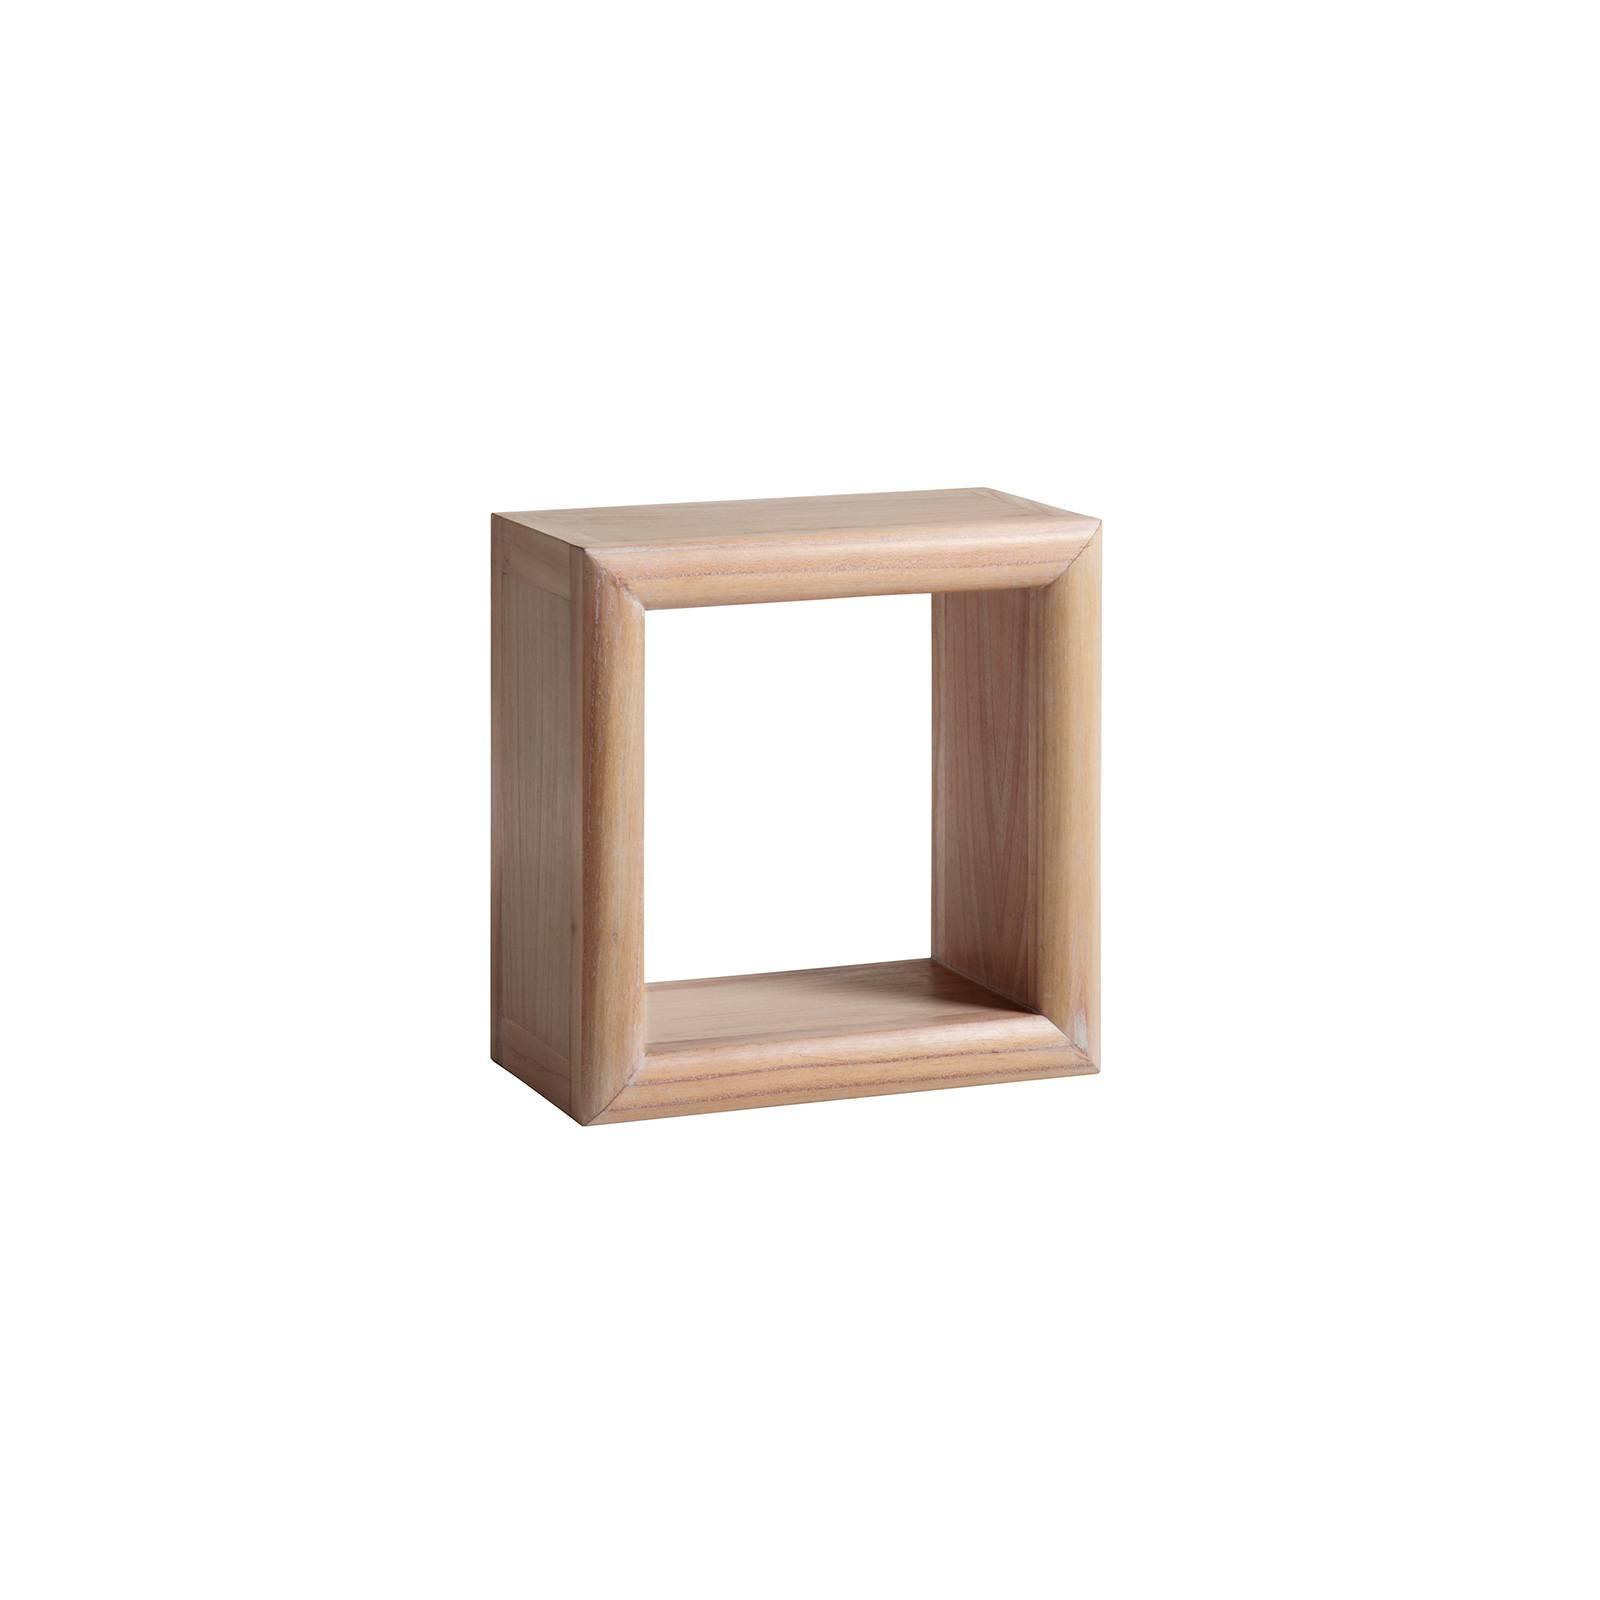 Étagère Cube Oslo Mindy - meubles scandinaves